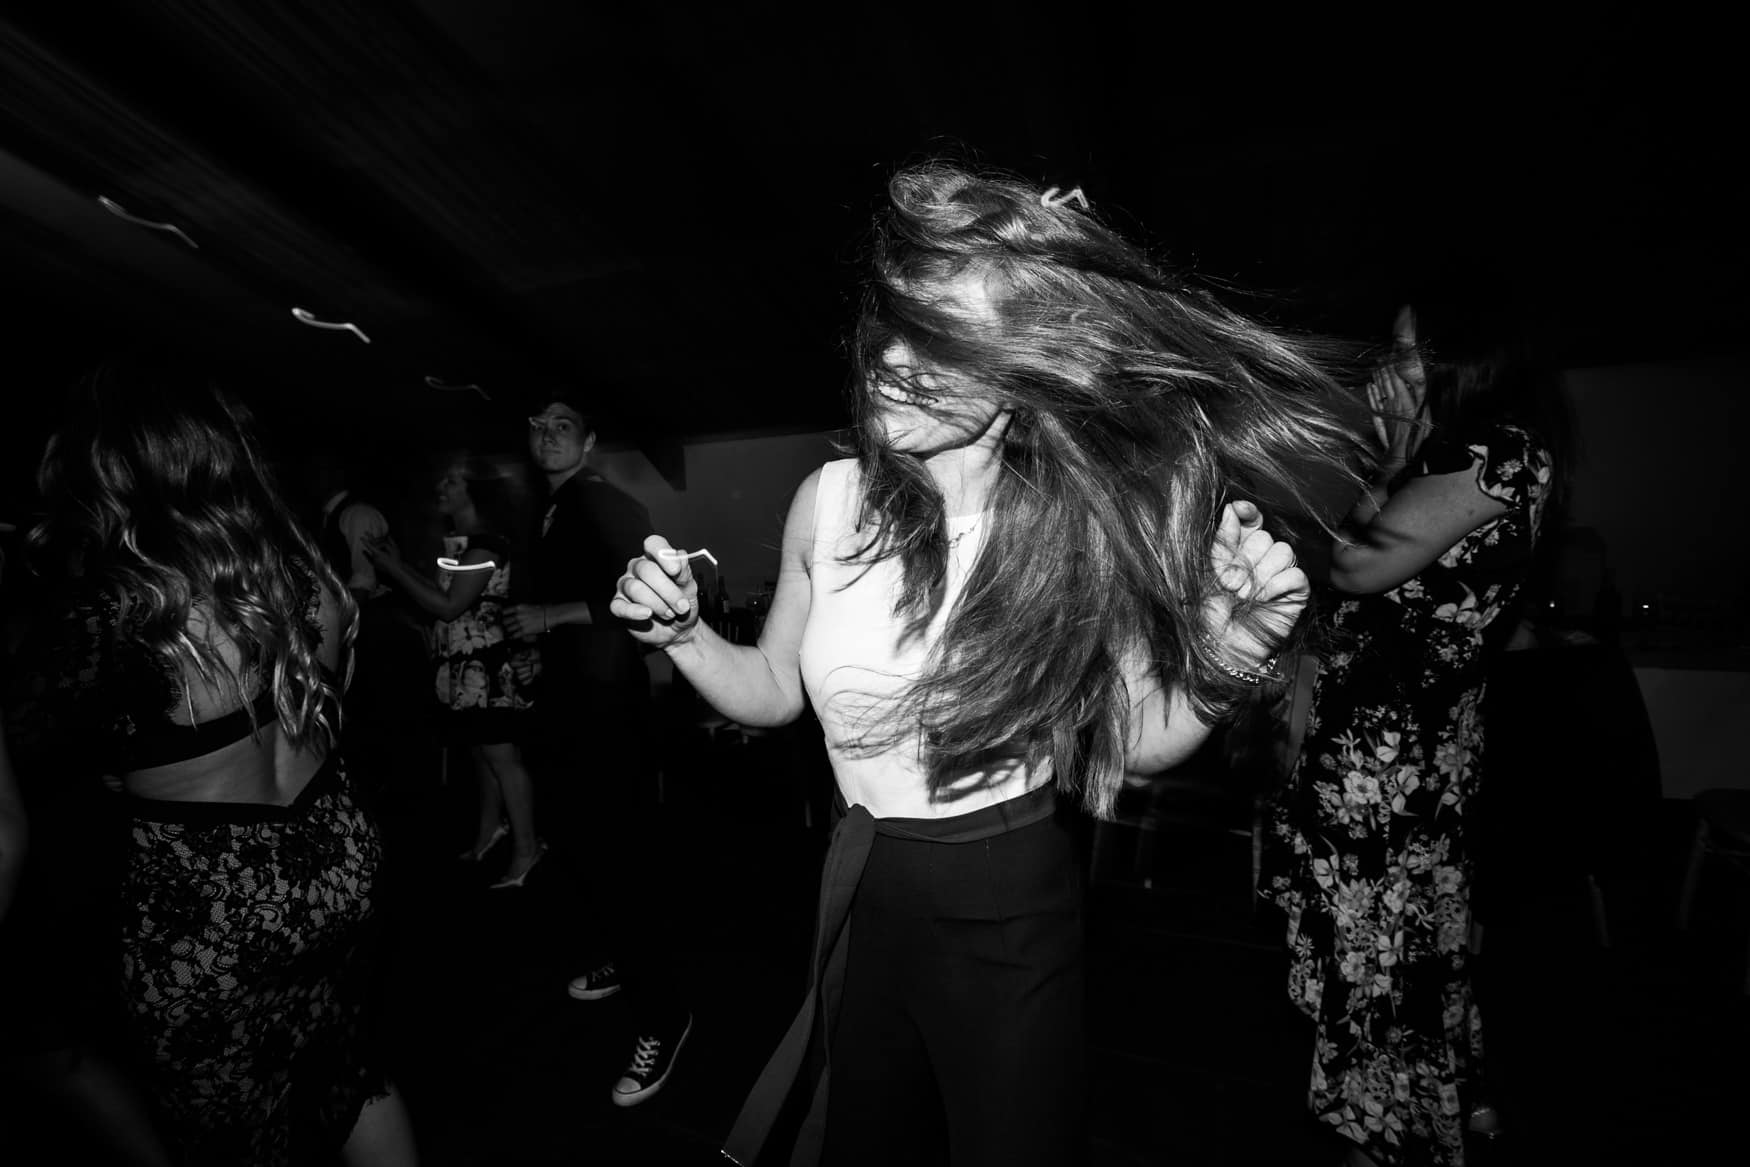 wedding crazy hair dancing